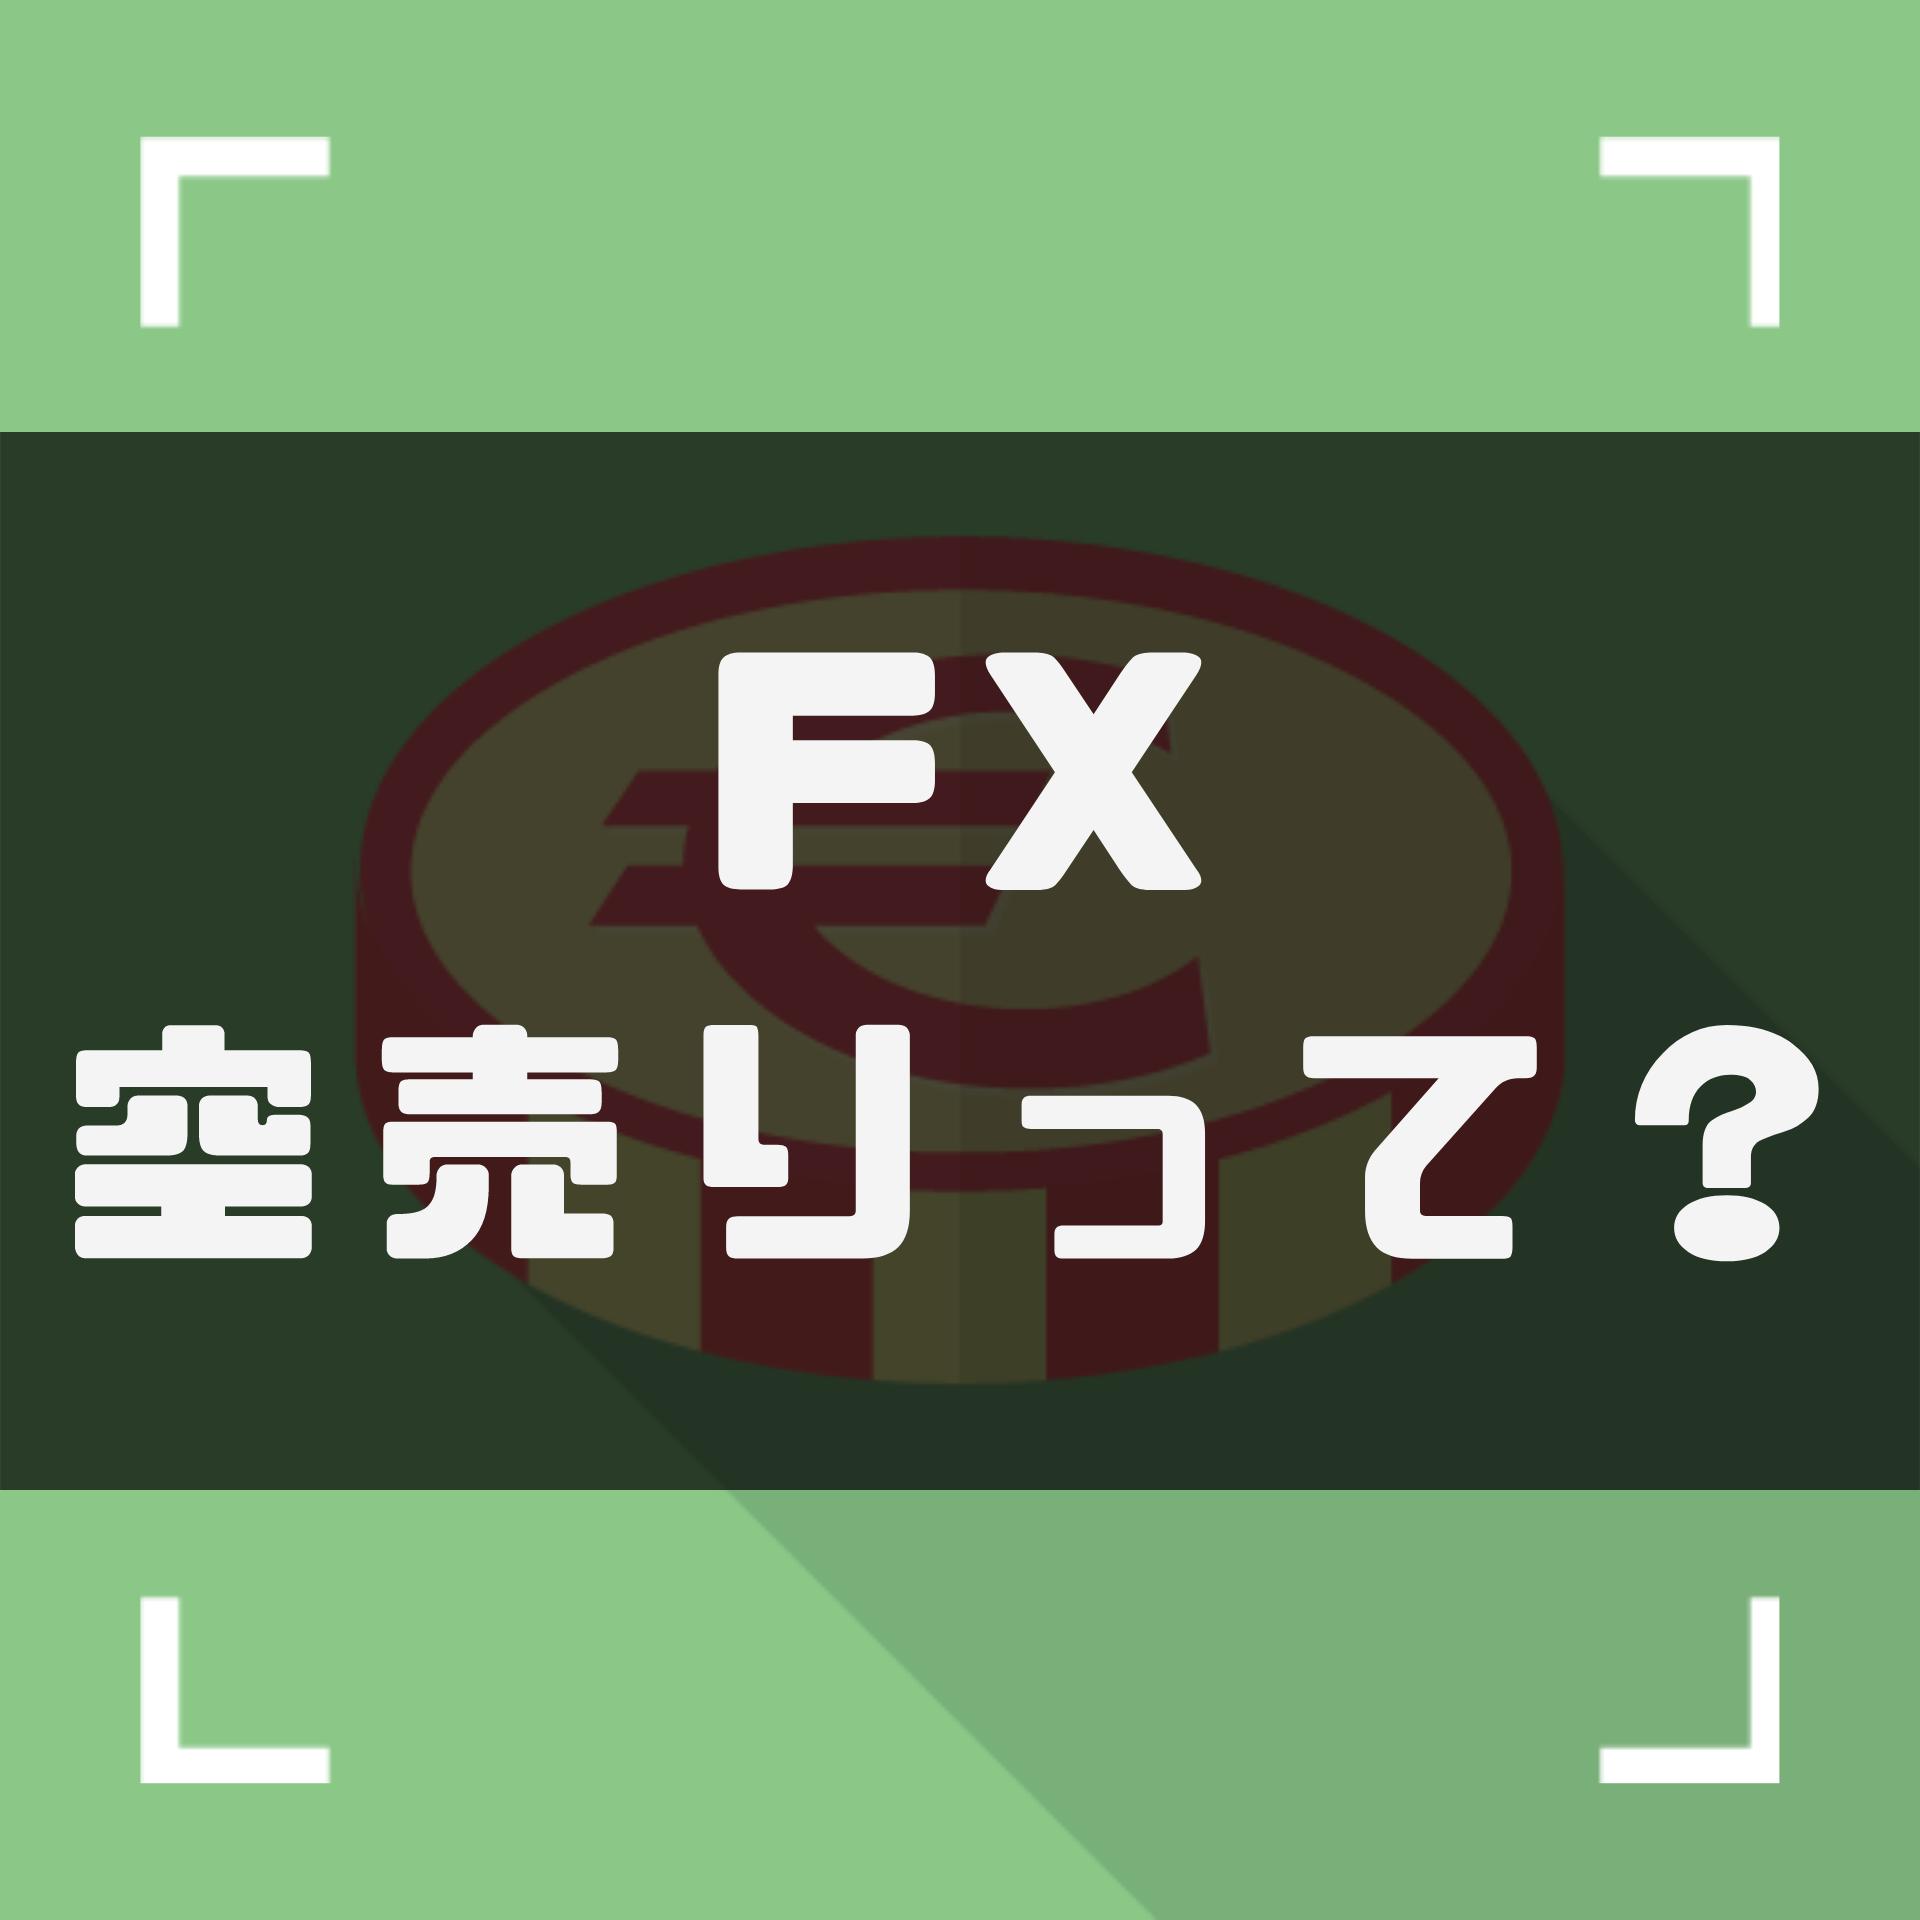 【FX用語】売りから入る(空売り)って?儲かる仕組みを初心者向けに解説!